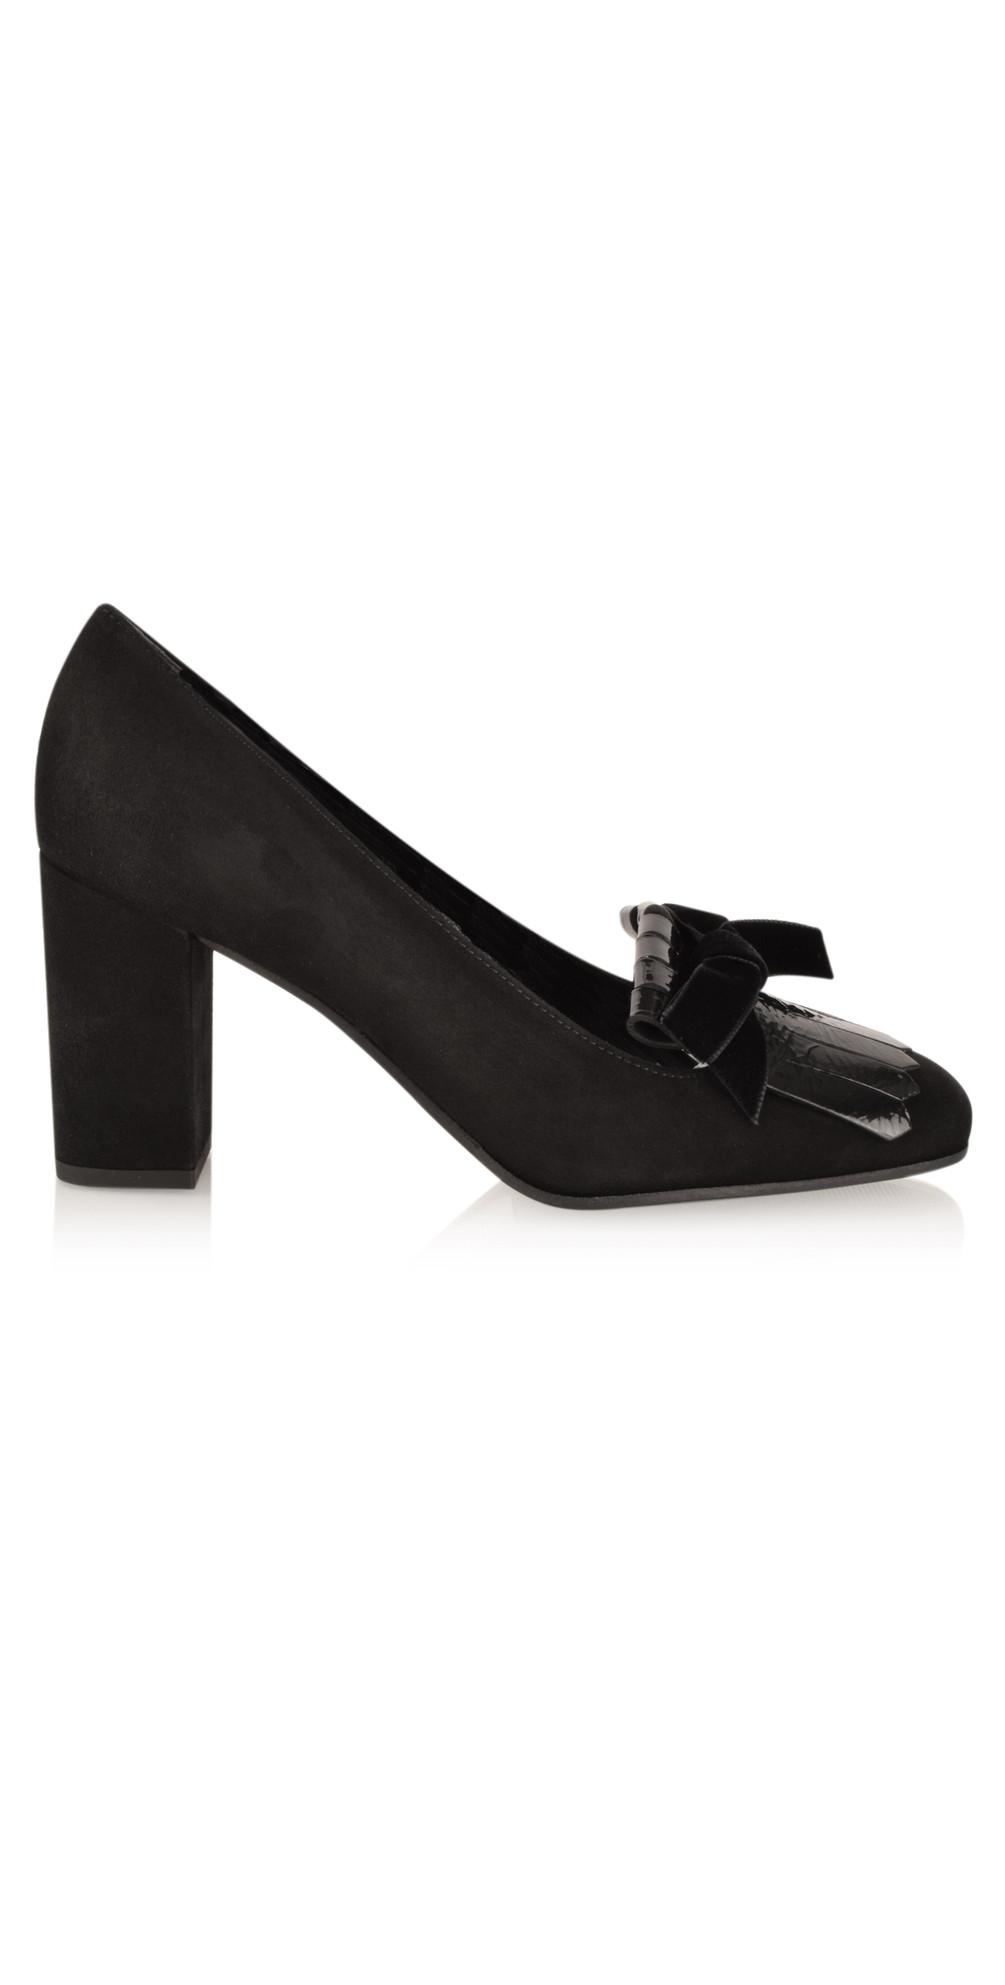 kennel und schmenger karen fringe classic lofa shoe in schwarz. Black Bedroom Furniture Sets. Home Design Ideas